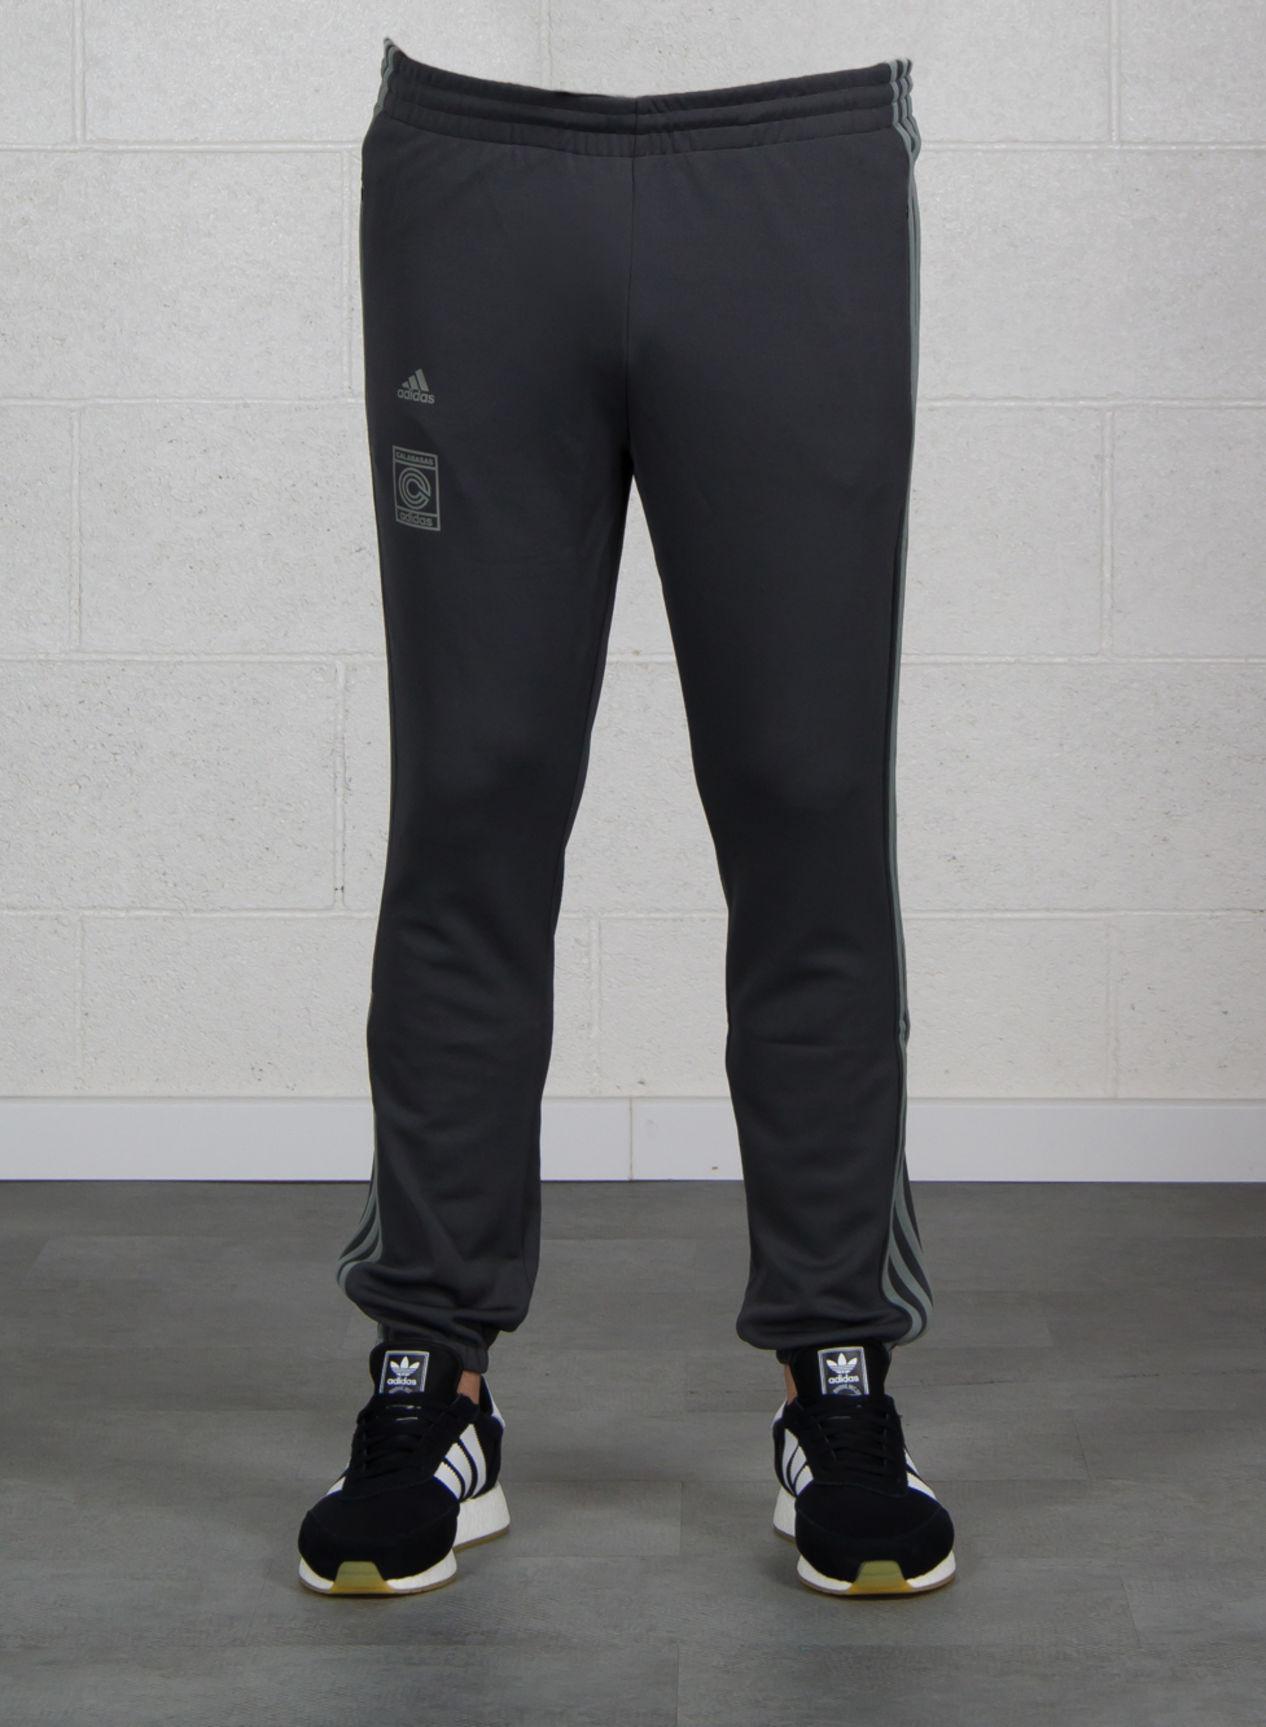 Pantaloni Adidas Calabasas Yeezy Kanye West